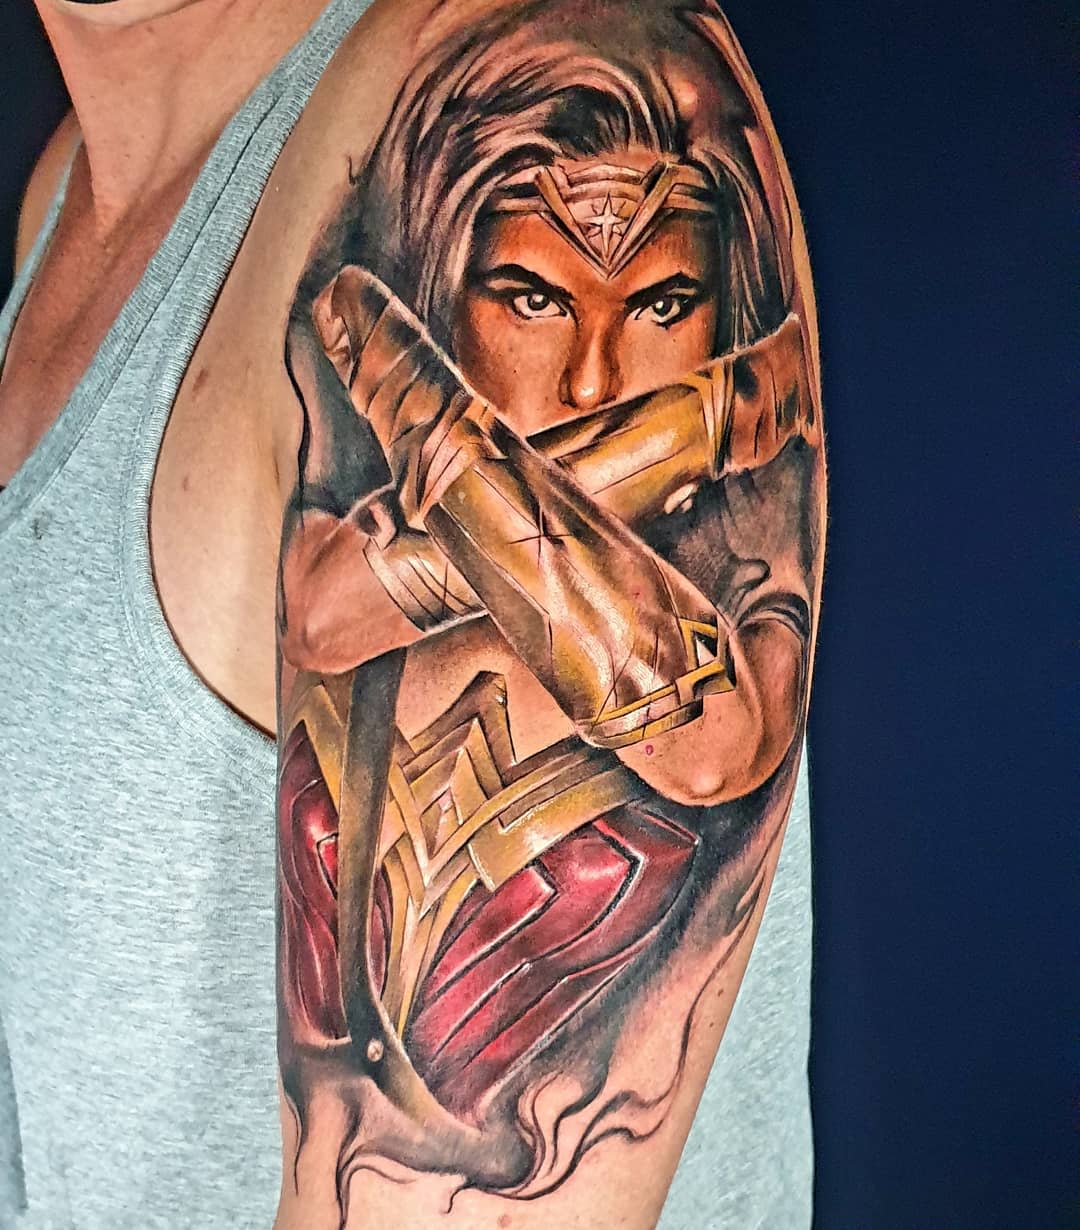 Realistic Wonder Woman Tattoo -ticklemehomo74